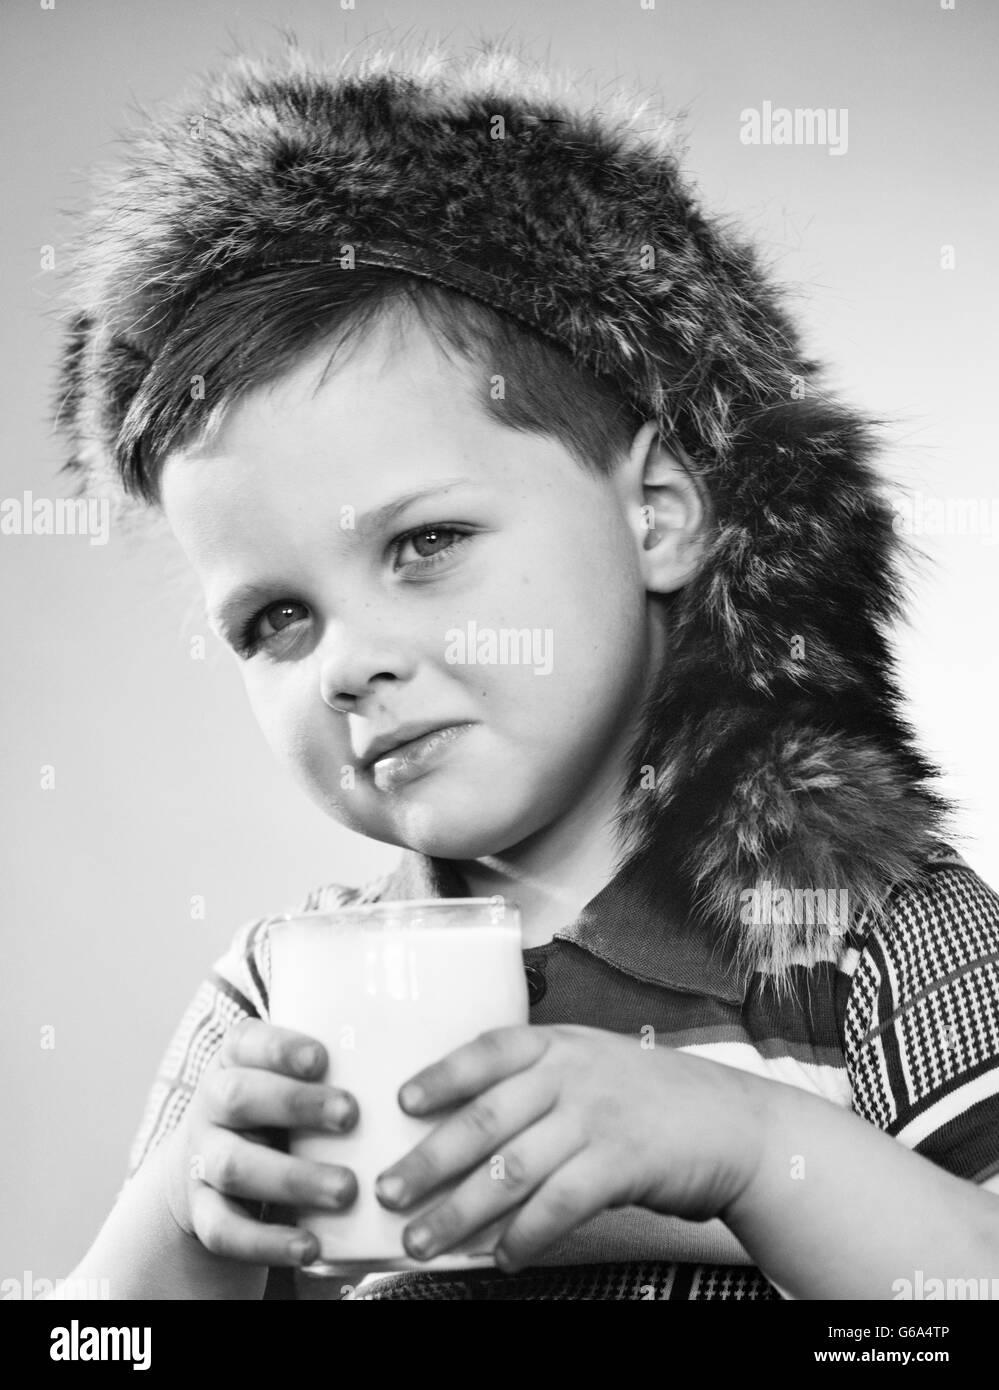 368d4e2eba8 1950s PORTRAIT BOY WEARING DAVY CROCKETT COONSKIN CAP HOLDING GLASS OF MILK  LOOKING AT CAMERA -